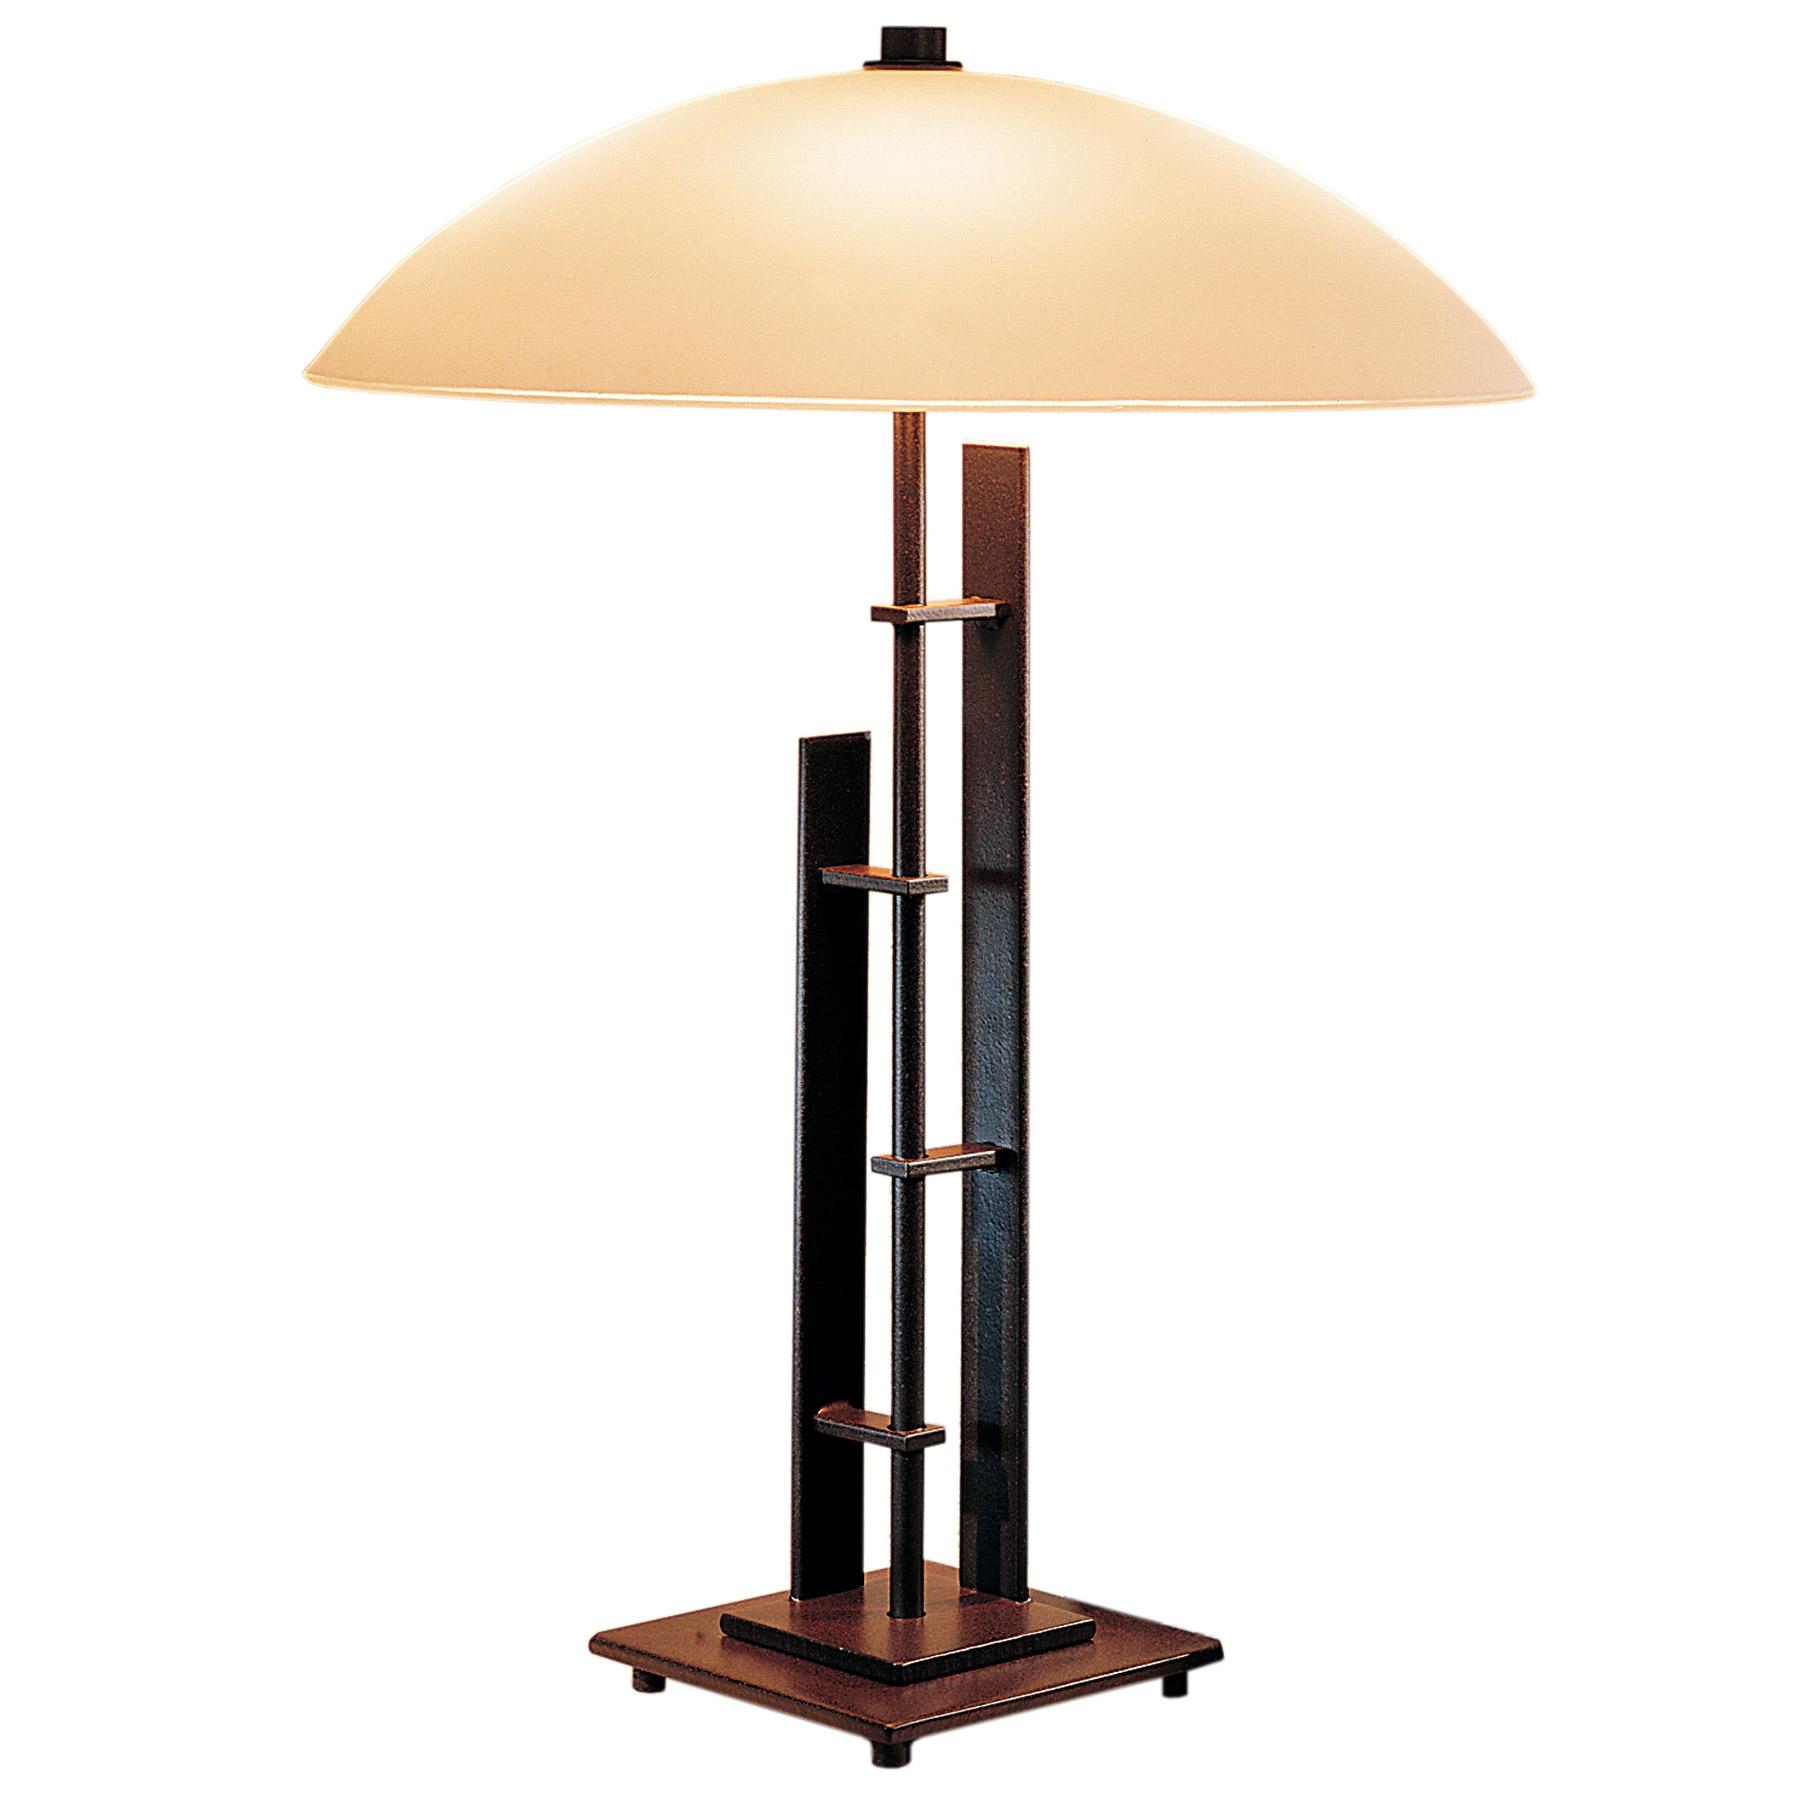 Hubbardton Forge Glass Shades: Metra Double Table Lamp Glass Shade By Hubbardton Forge